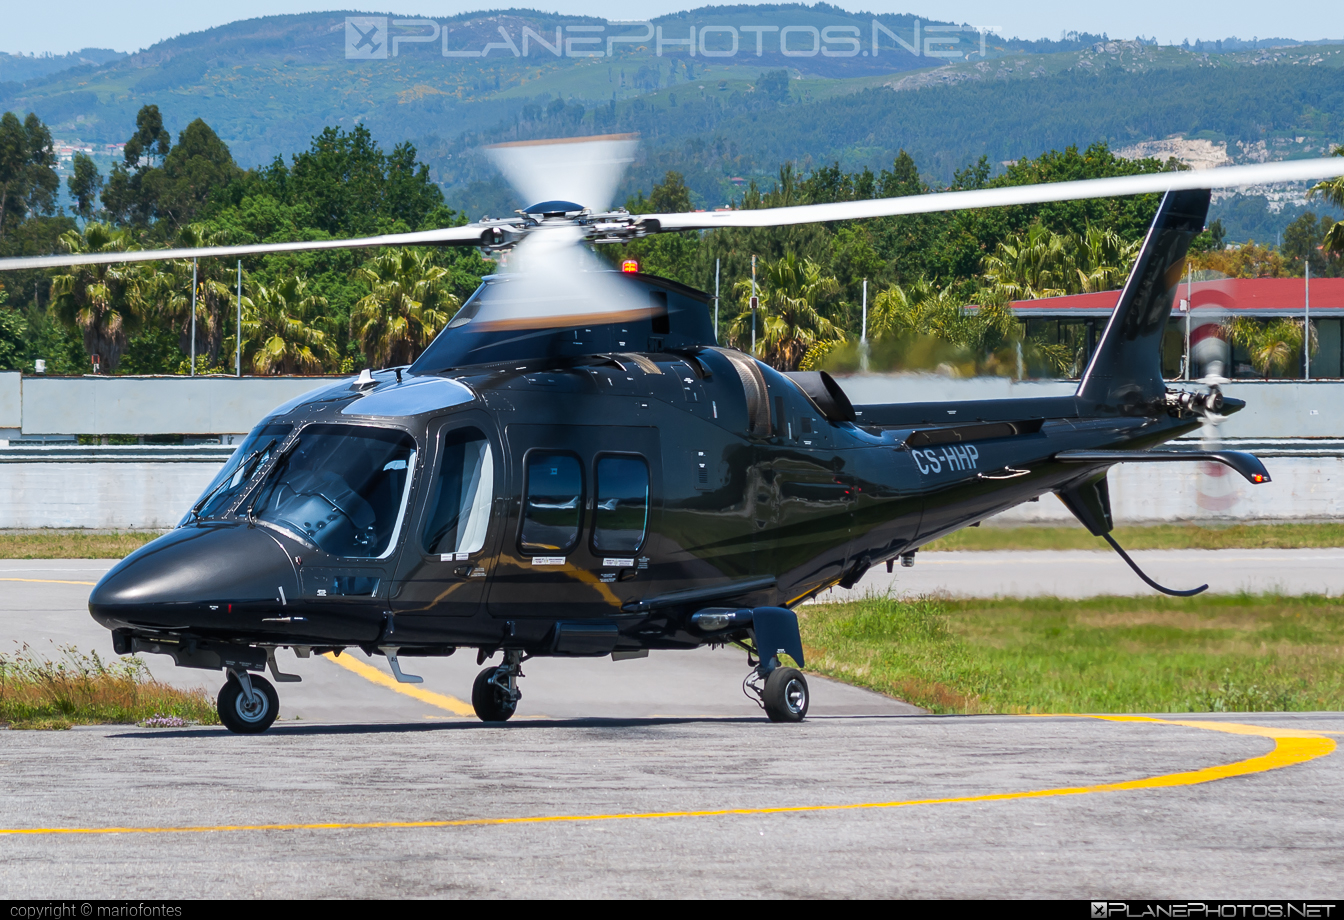 AgustaWestland AW109SP Grand New - CS-HHP operated by Vinair Aeroserviços S.A. #a109 #agustawestland #aw109 #aw109grandnew #aw109sp #aw109spgrandnew #vinair #vinairaeroservicos